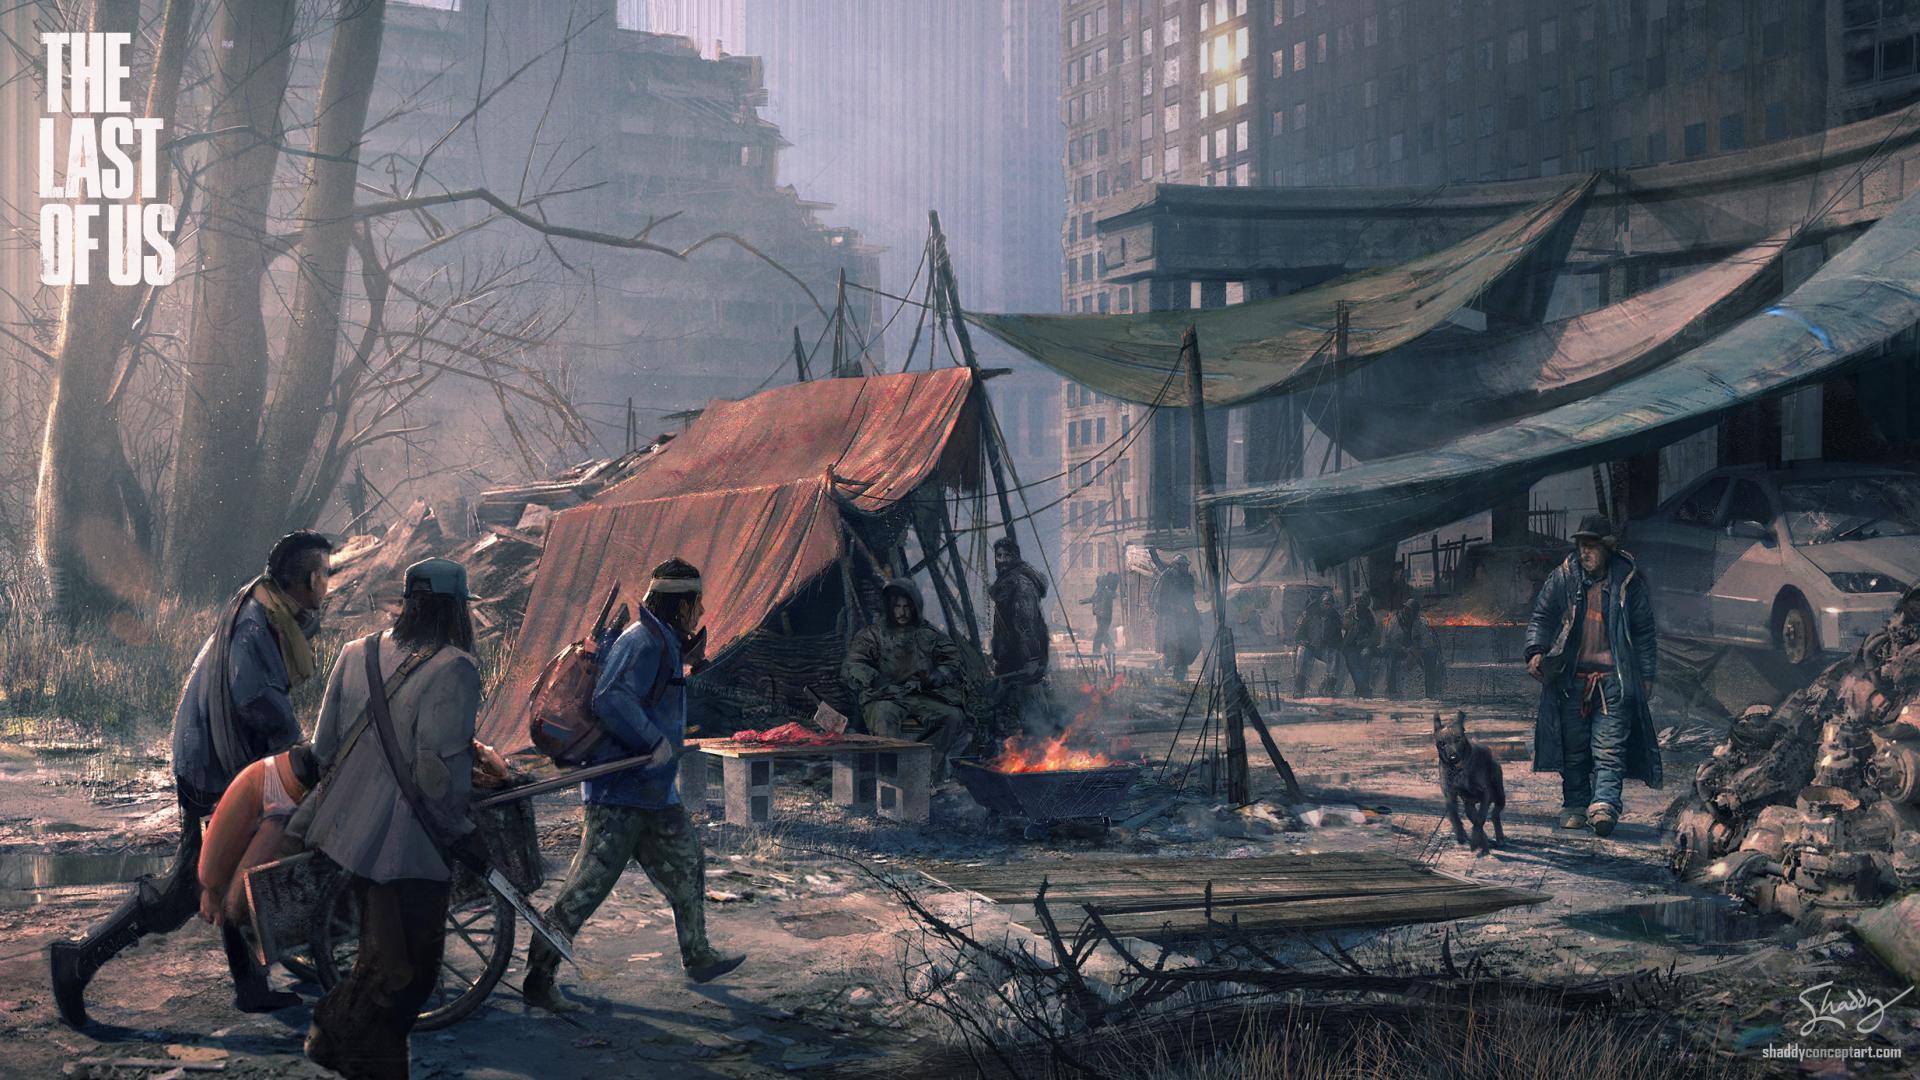 1920x1080 The Last Of Us City Doomsday 1080p Laptop Full Hd